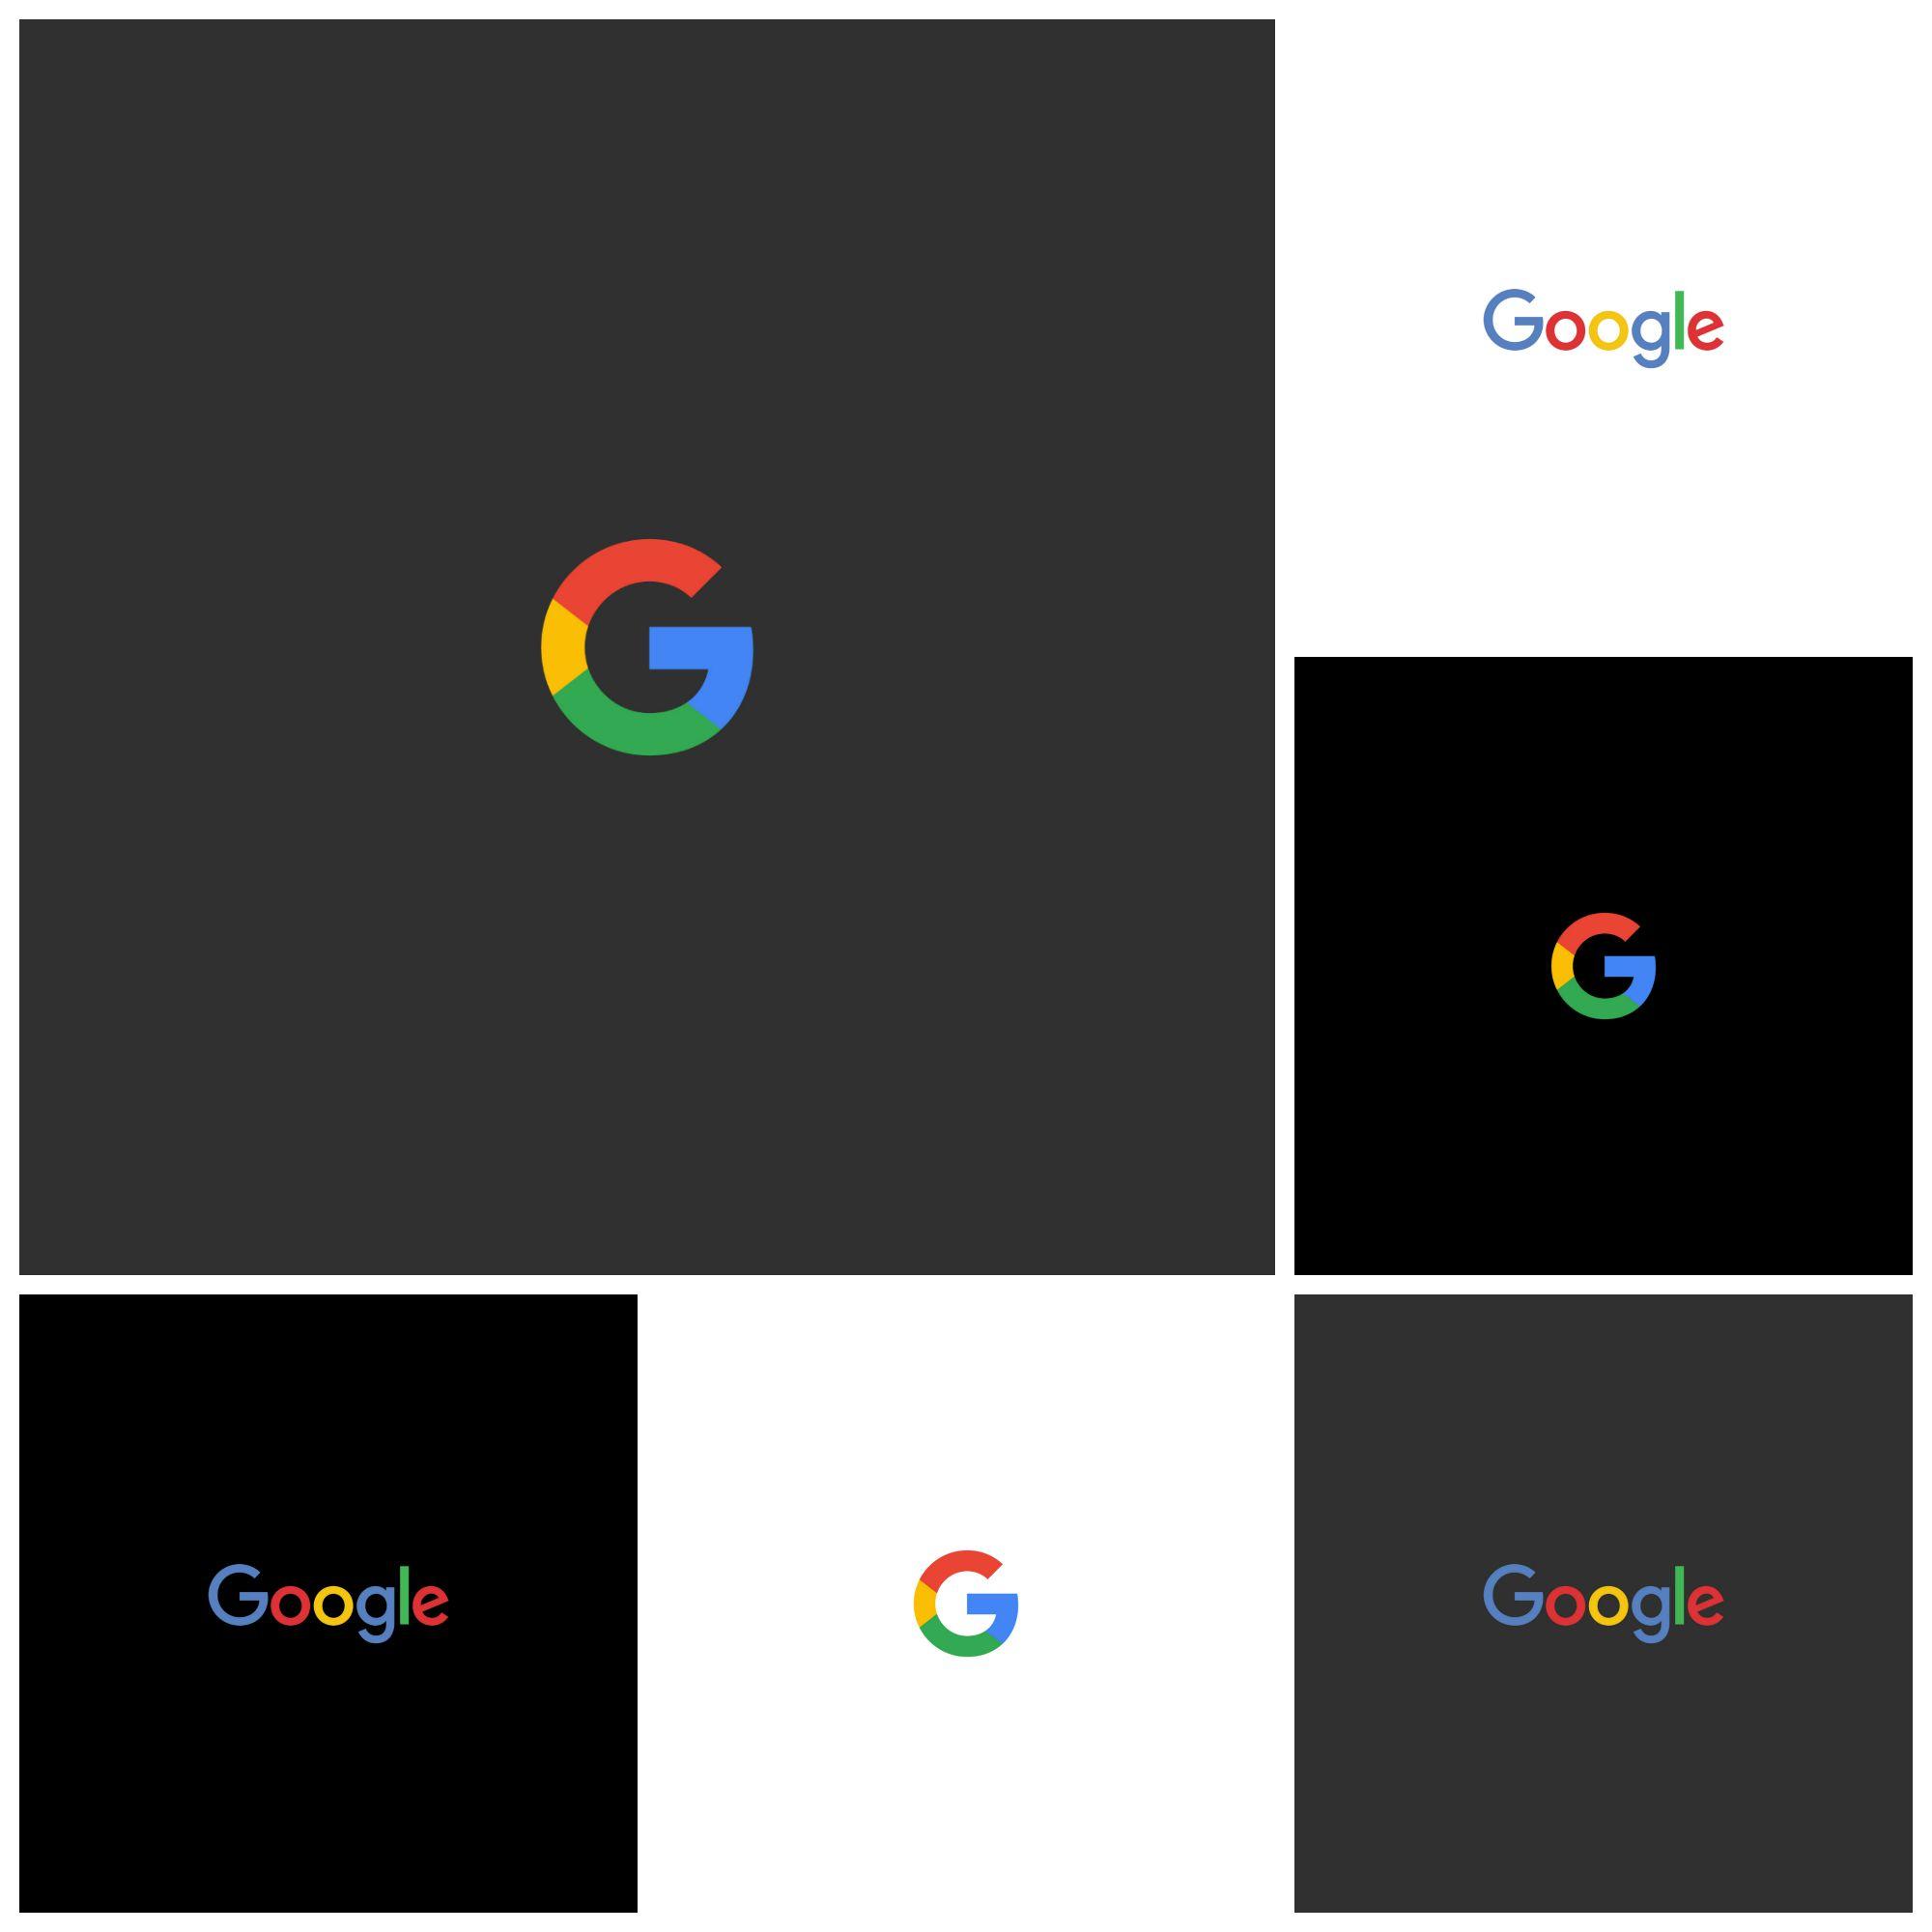 new wallpaper for google - photo #31